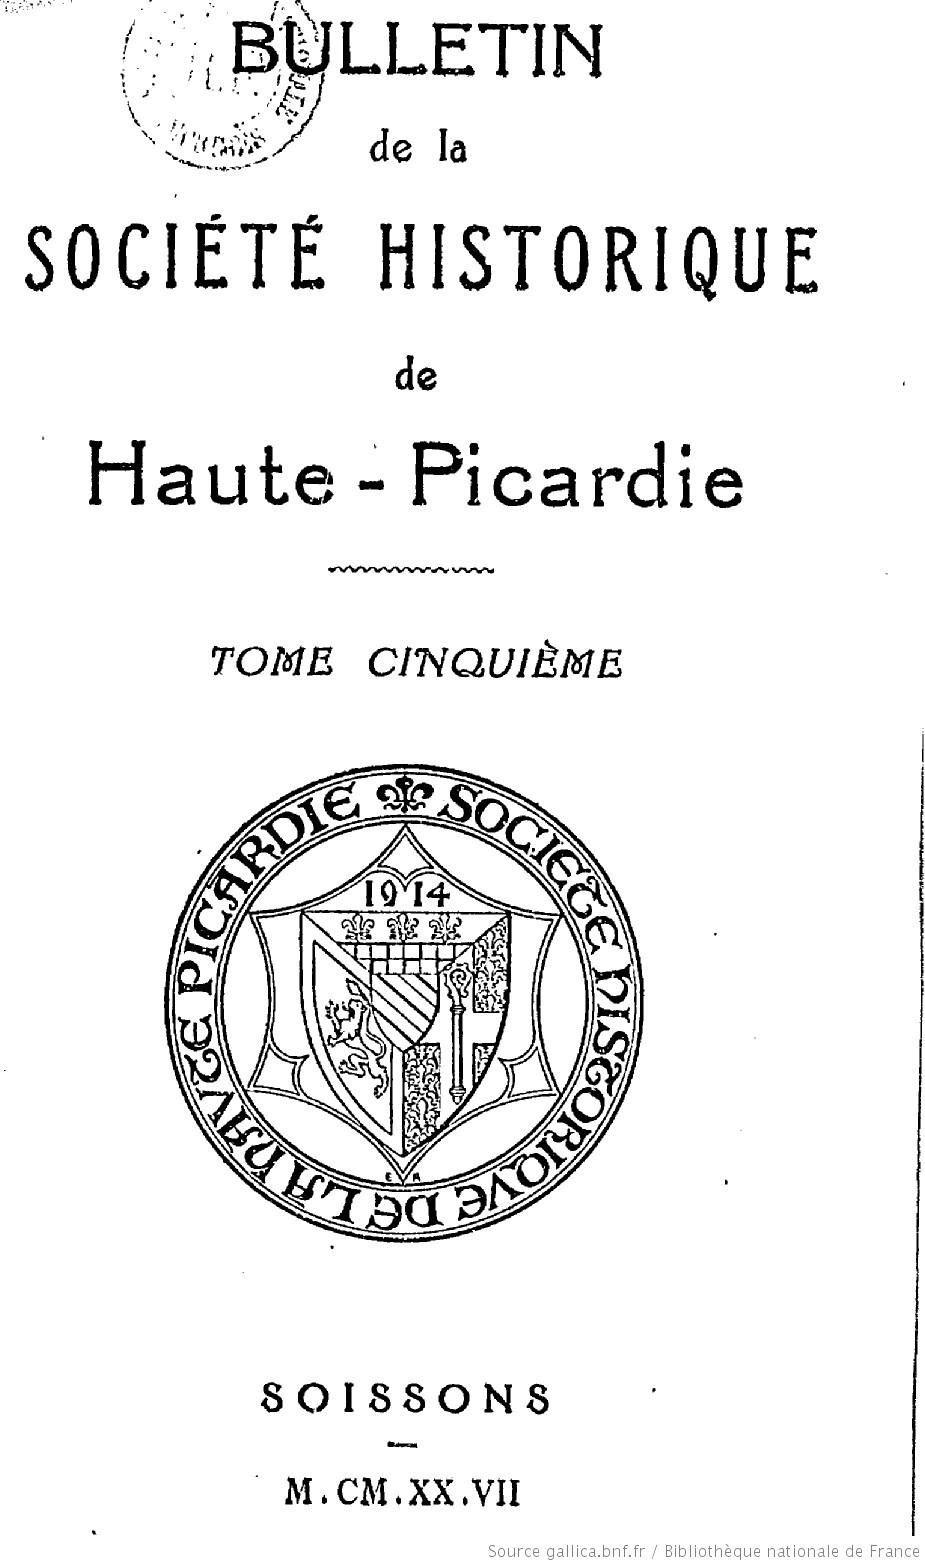 https://gallica.bnf.fr/ark:/12148/bpt6k5461250h.highres.jpg